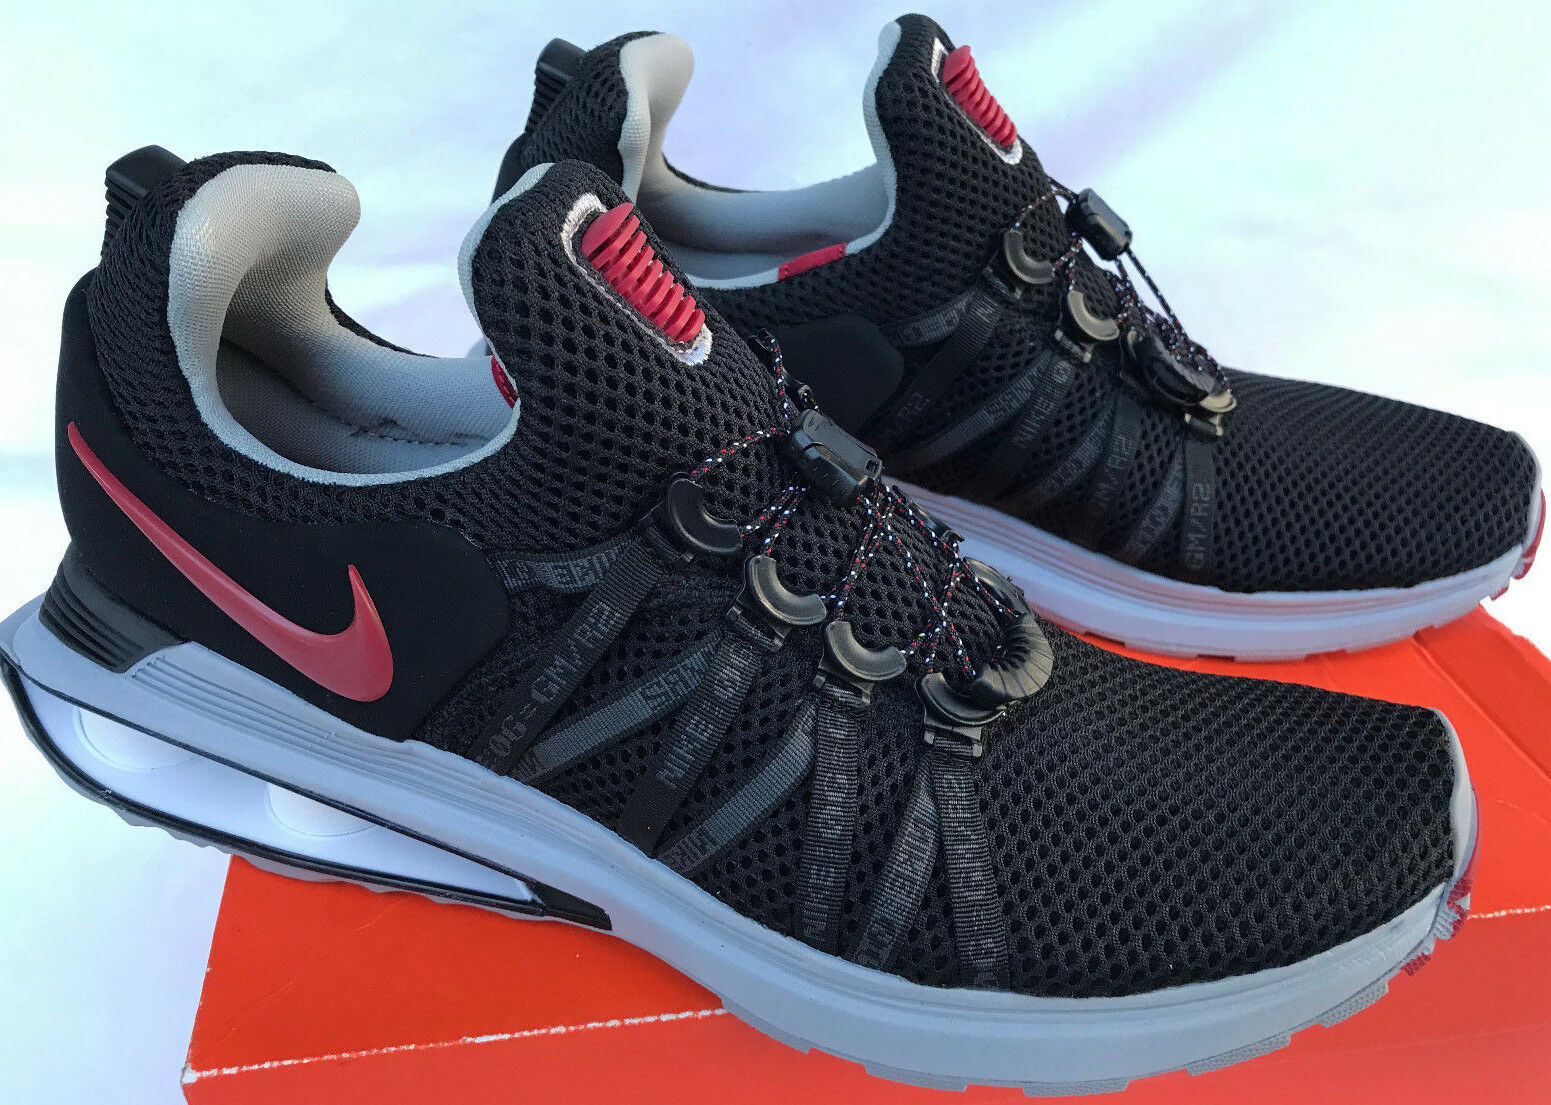 Nike Shox Gravity AR1999-016 Black NZ Casual Marathon Running shoes Men's 15 new